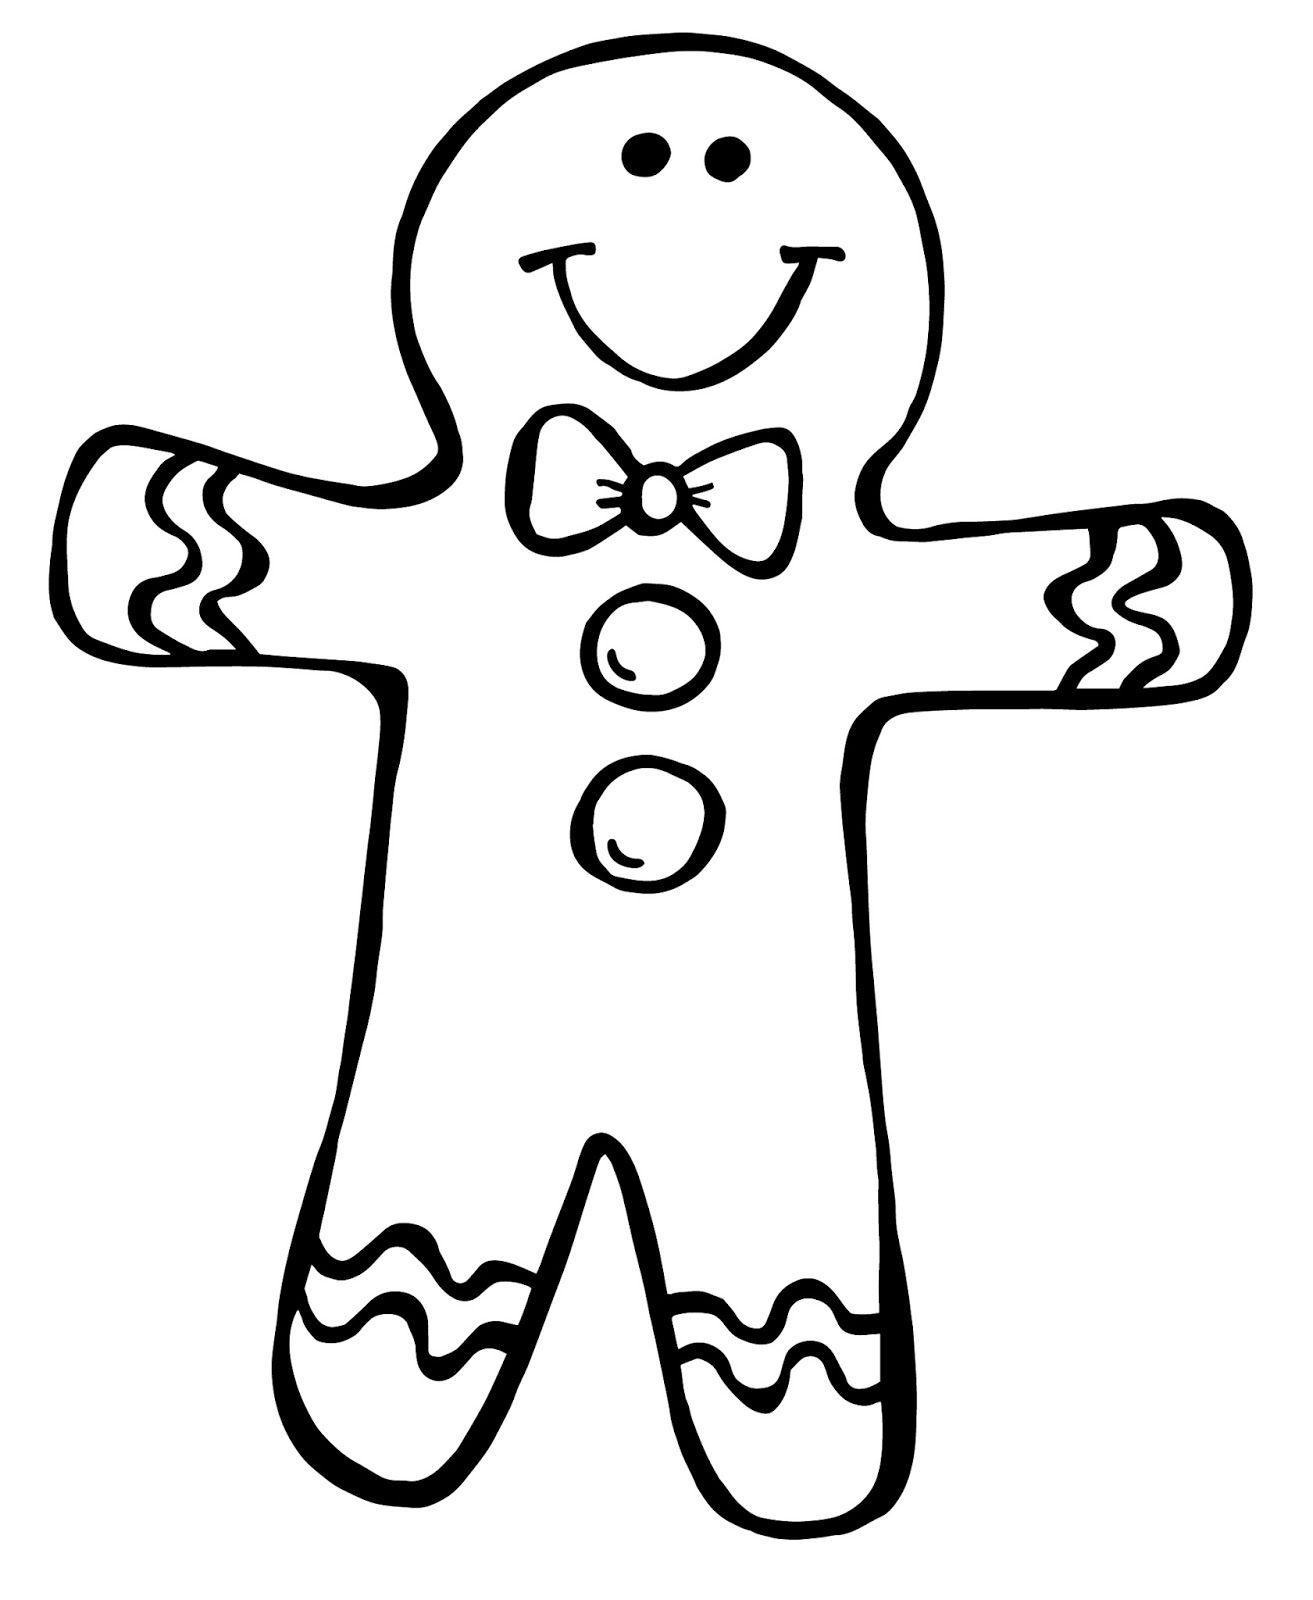 Gingerbread Man Drawing At Getdrawings